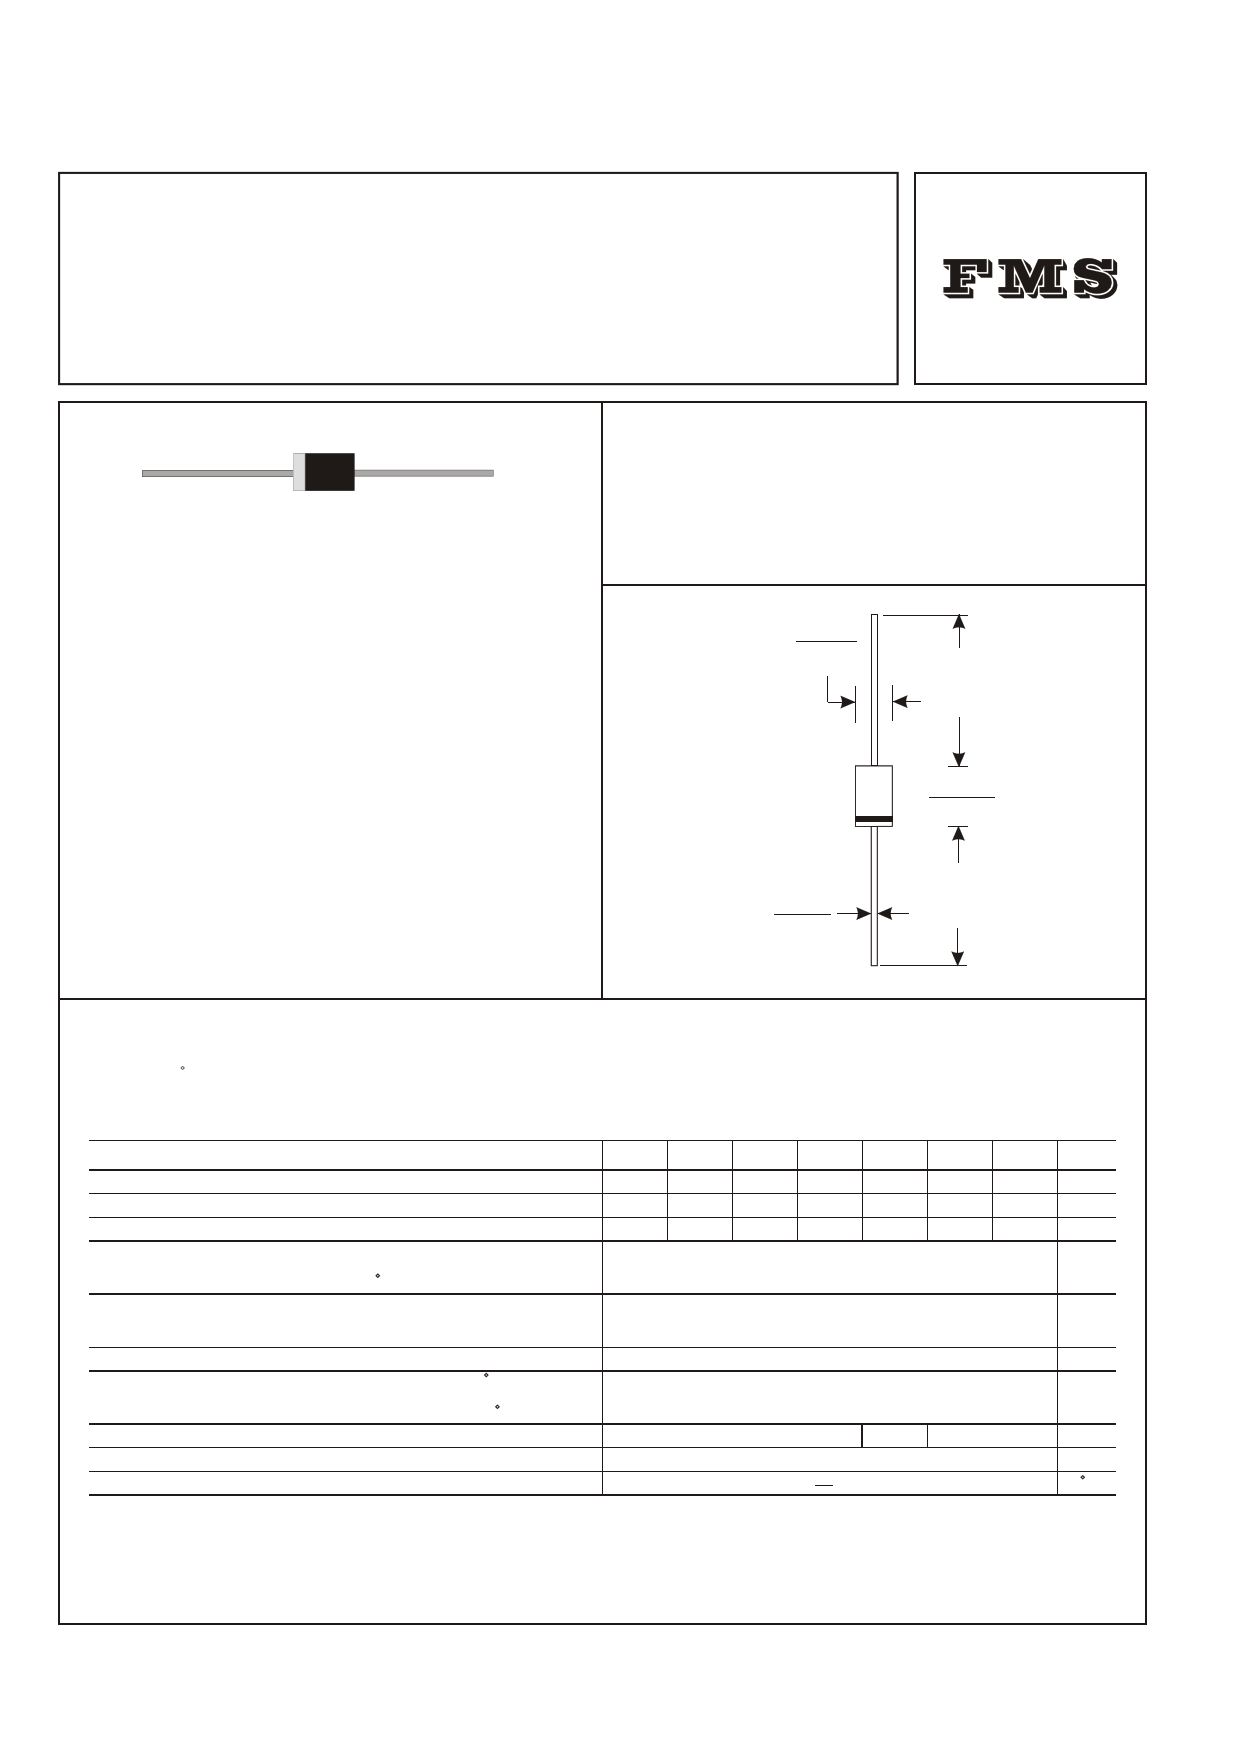 Fr302 datasheet